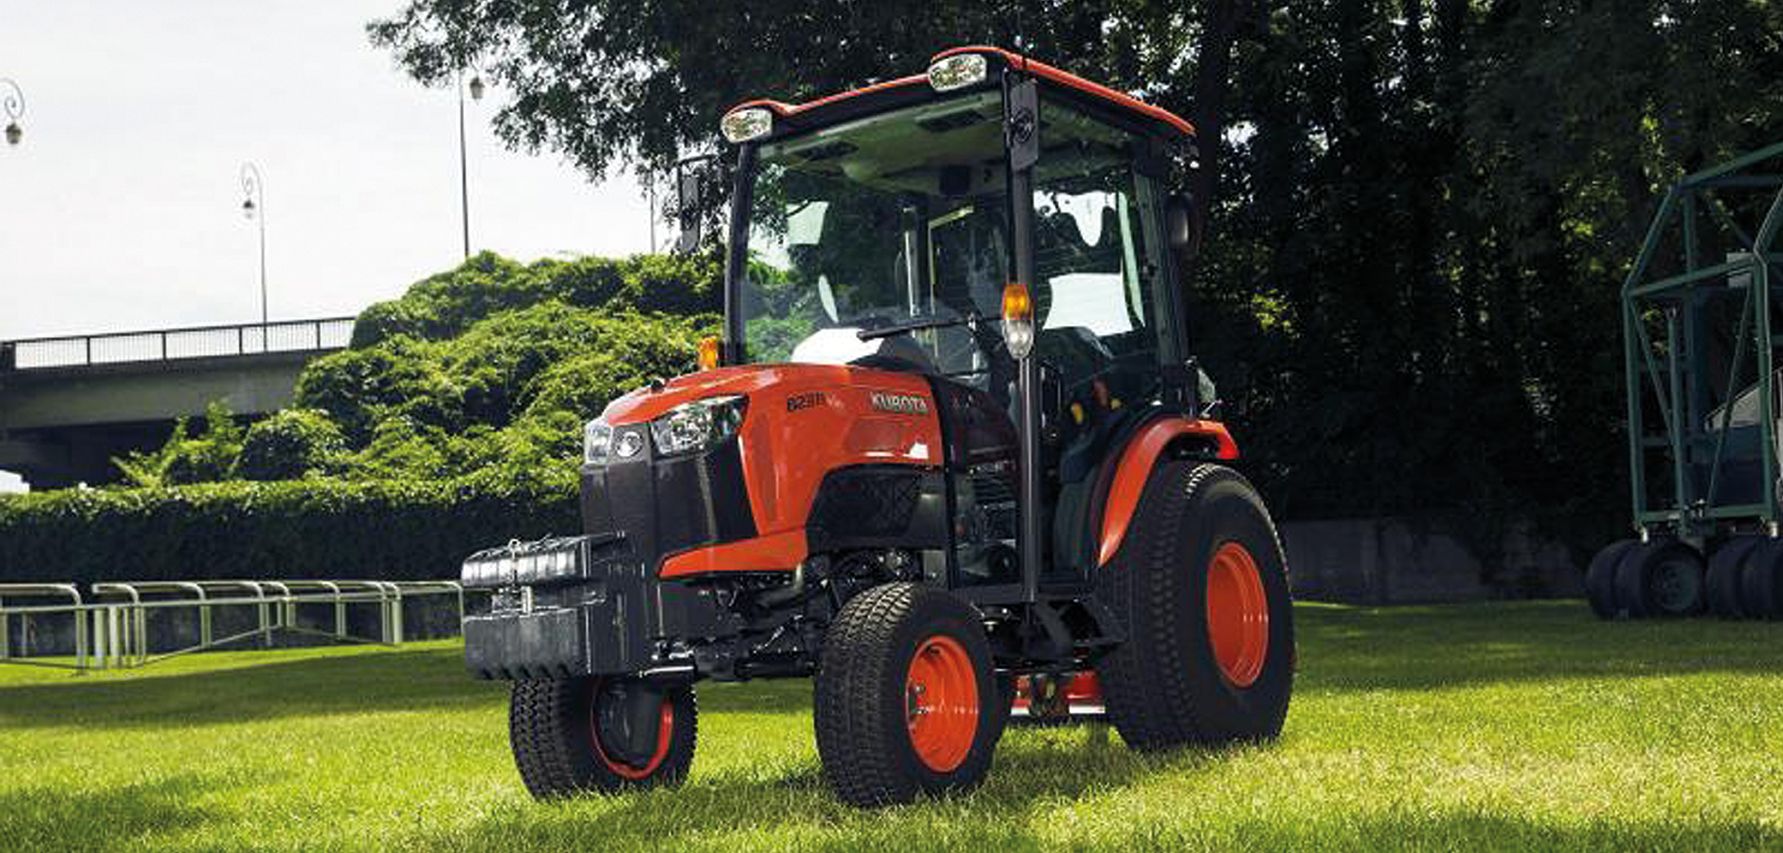 Kubota shows its new B Series compact tractors at LAMMA - Tillage